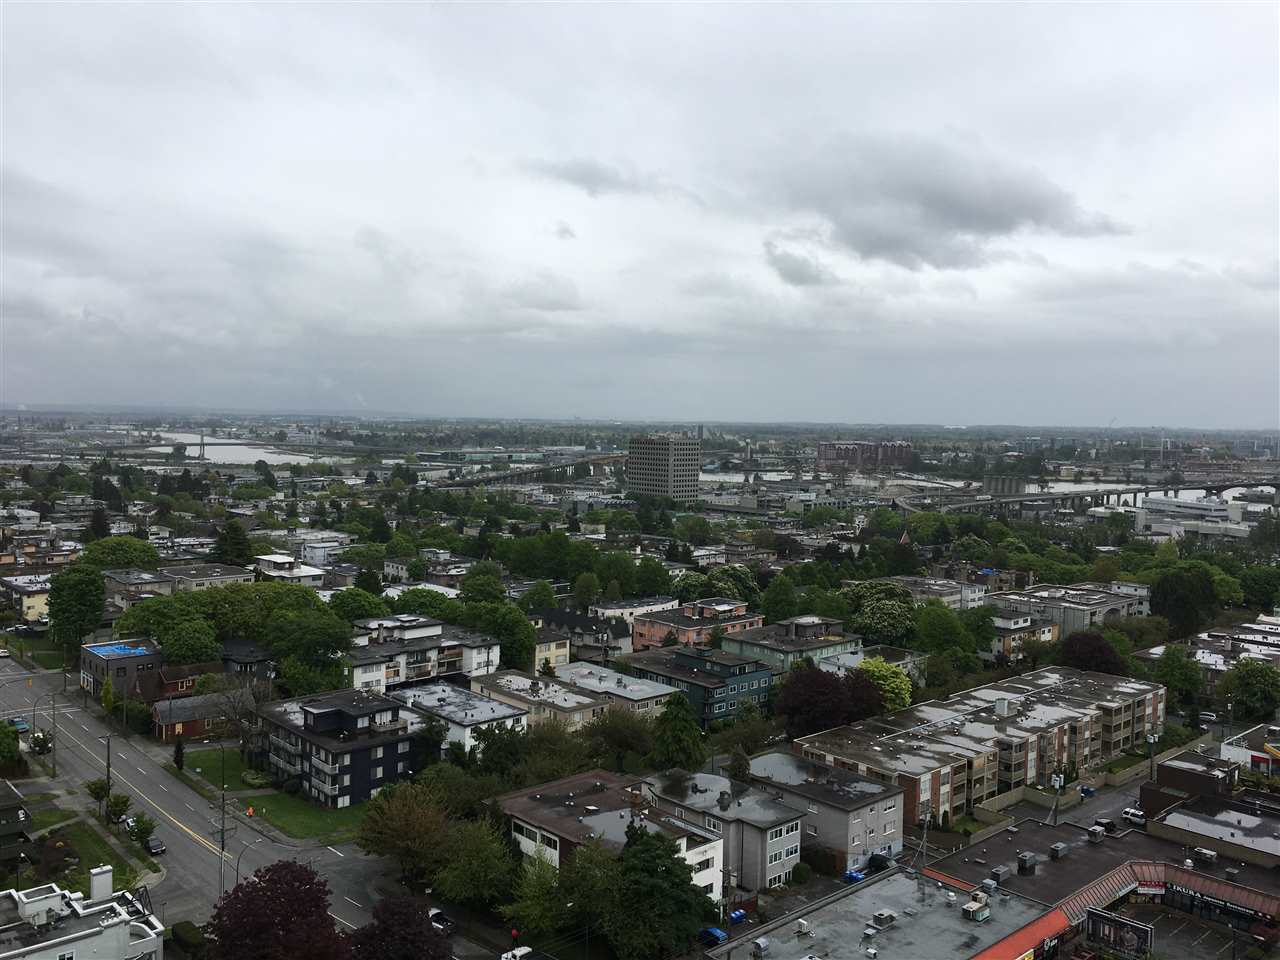 Condo Apartment at 2107 8555 GRANVILLE STREET, Unit 2107, Vancouver West, British Columbia. Image 1